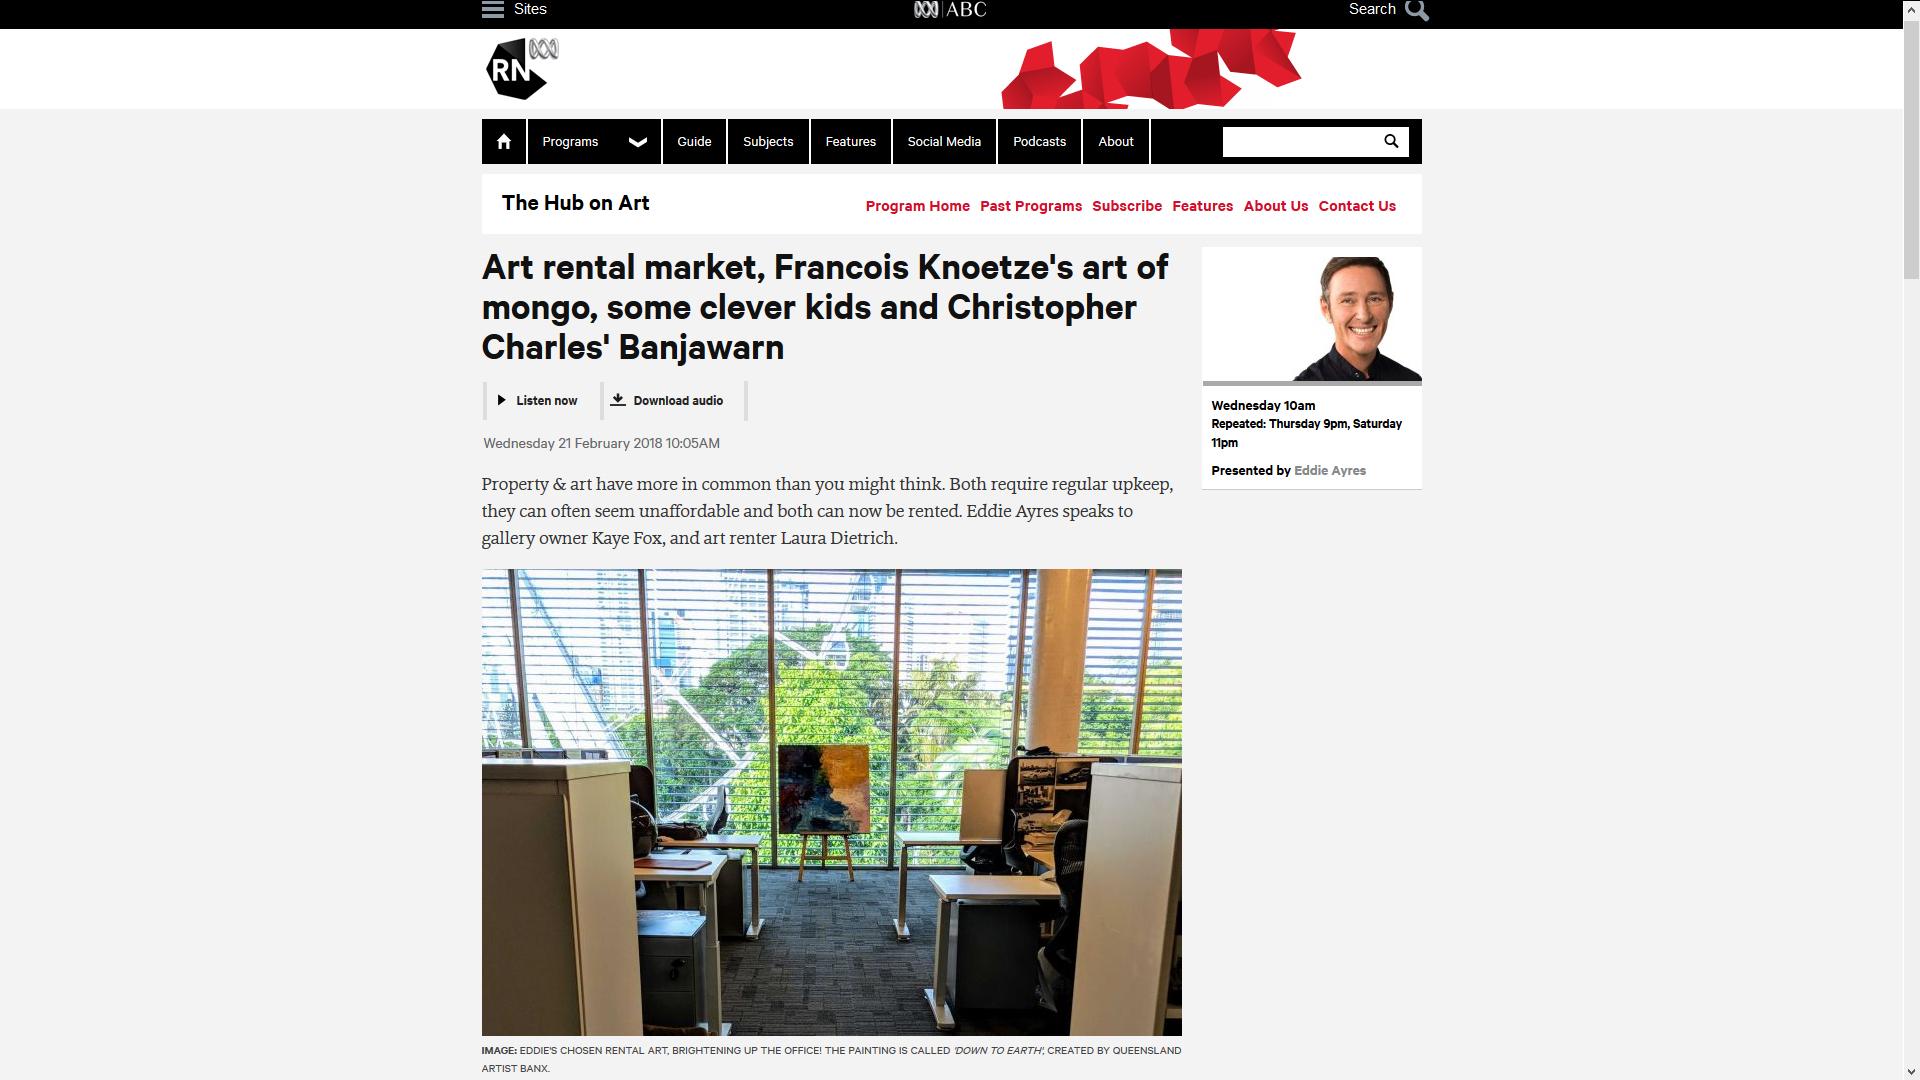 ABC - The Hub on Art by Eddies Ayres - 21.8.18